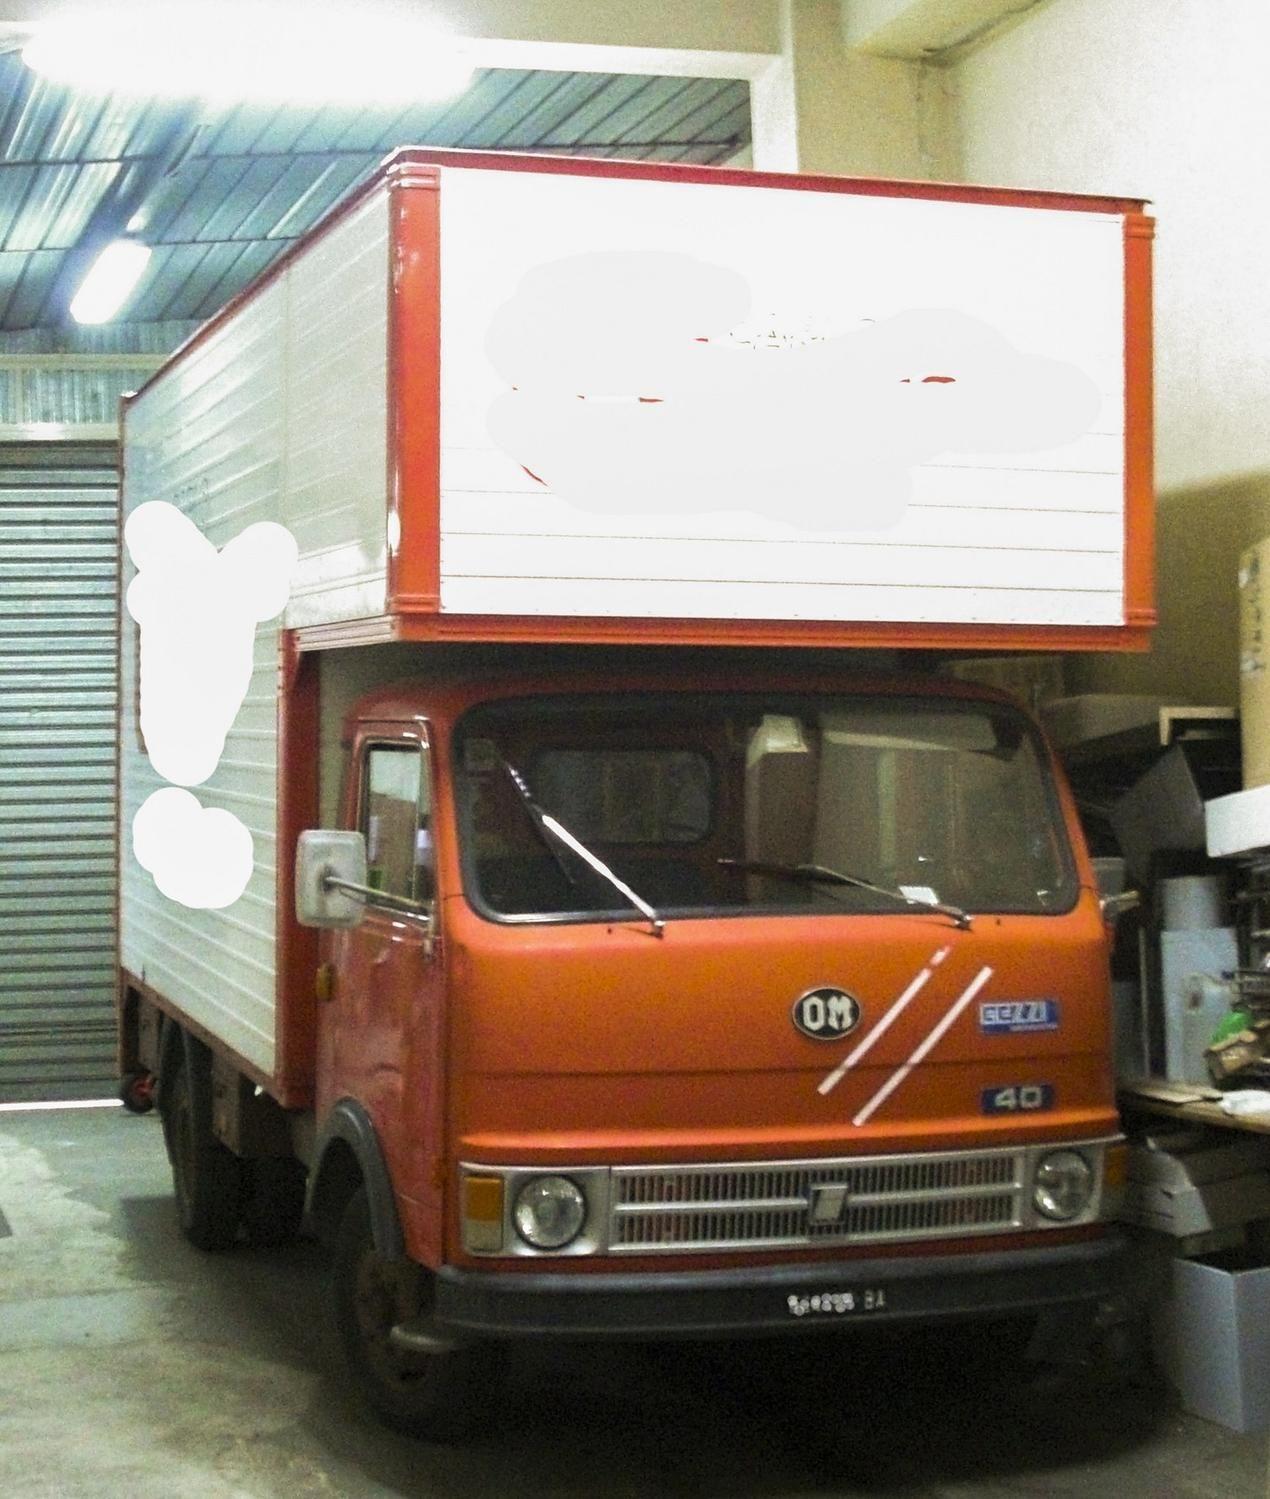 Fiat OM 40 35 B LKW